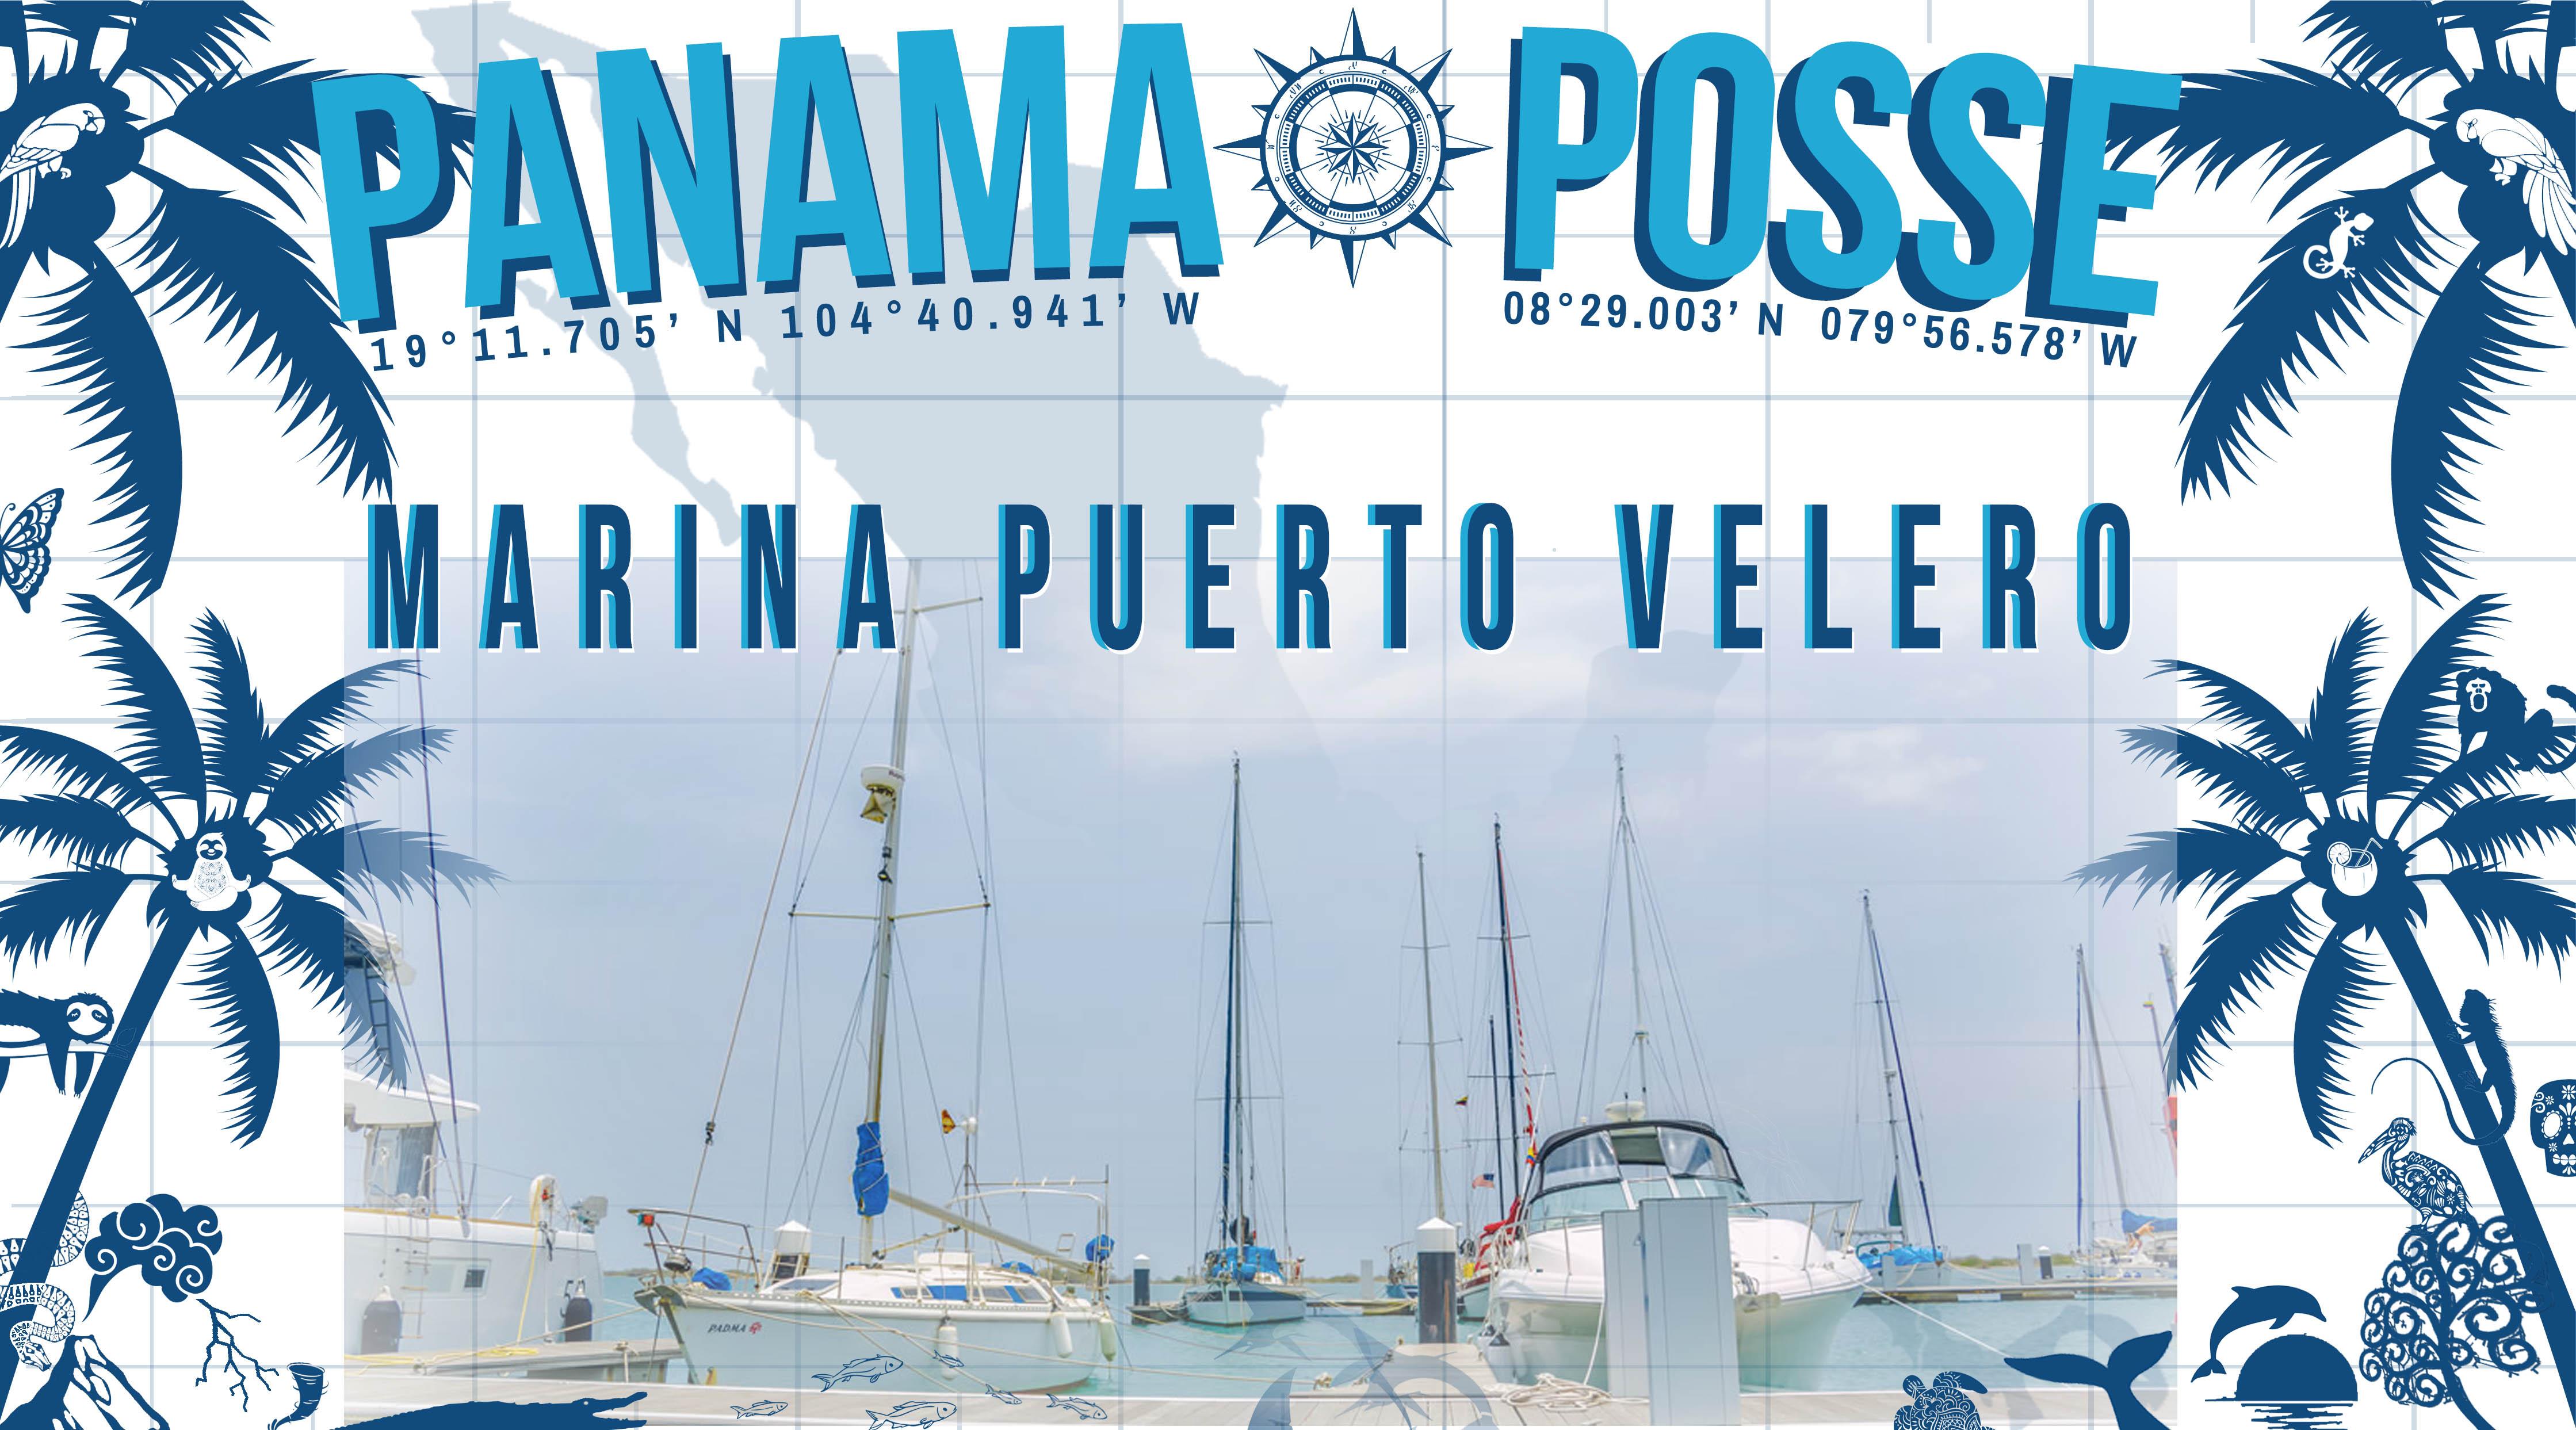 Marina Puerto Velero